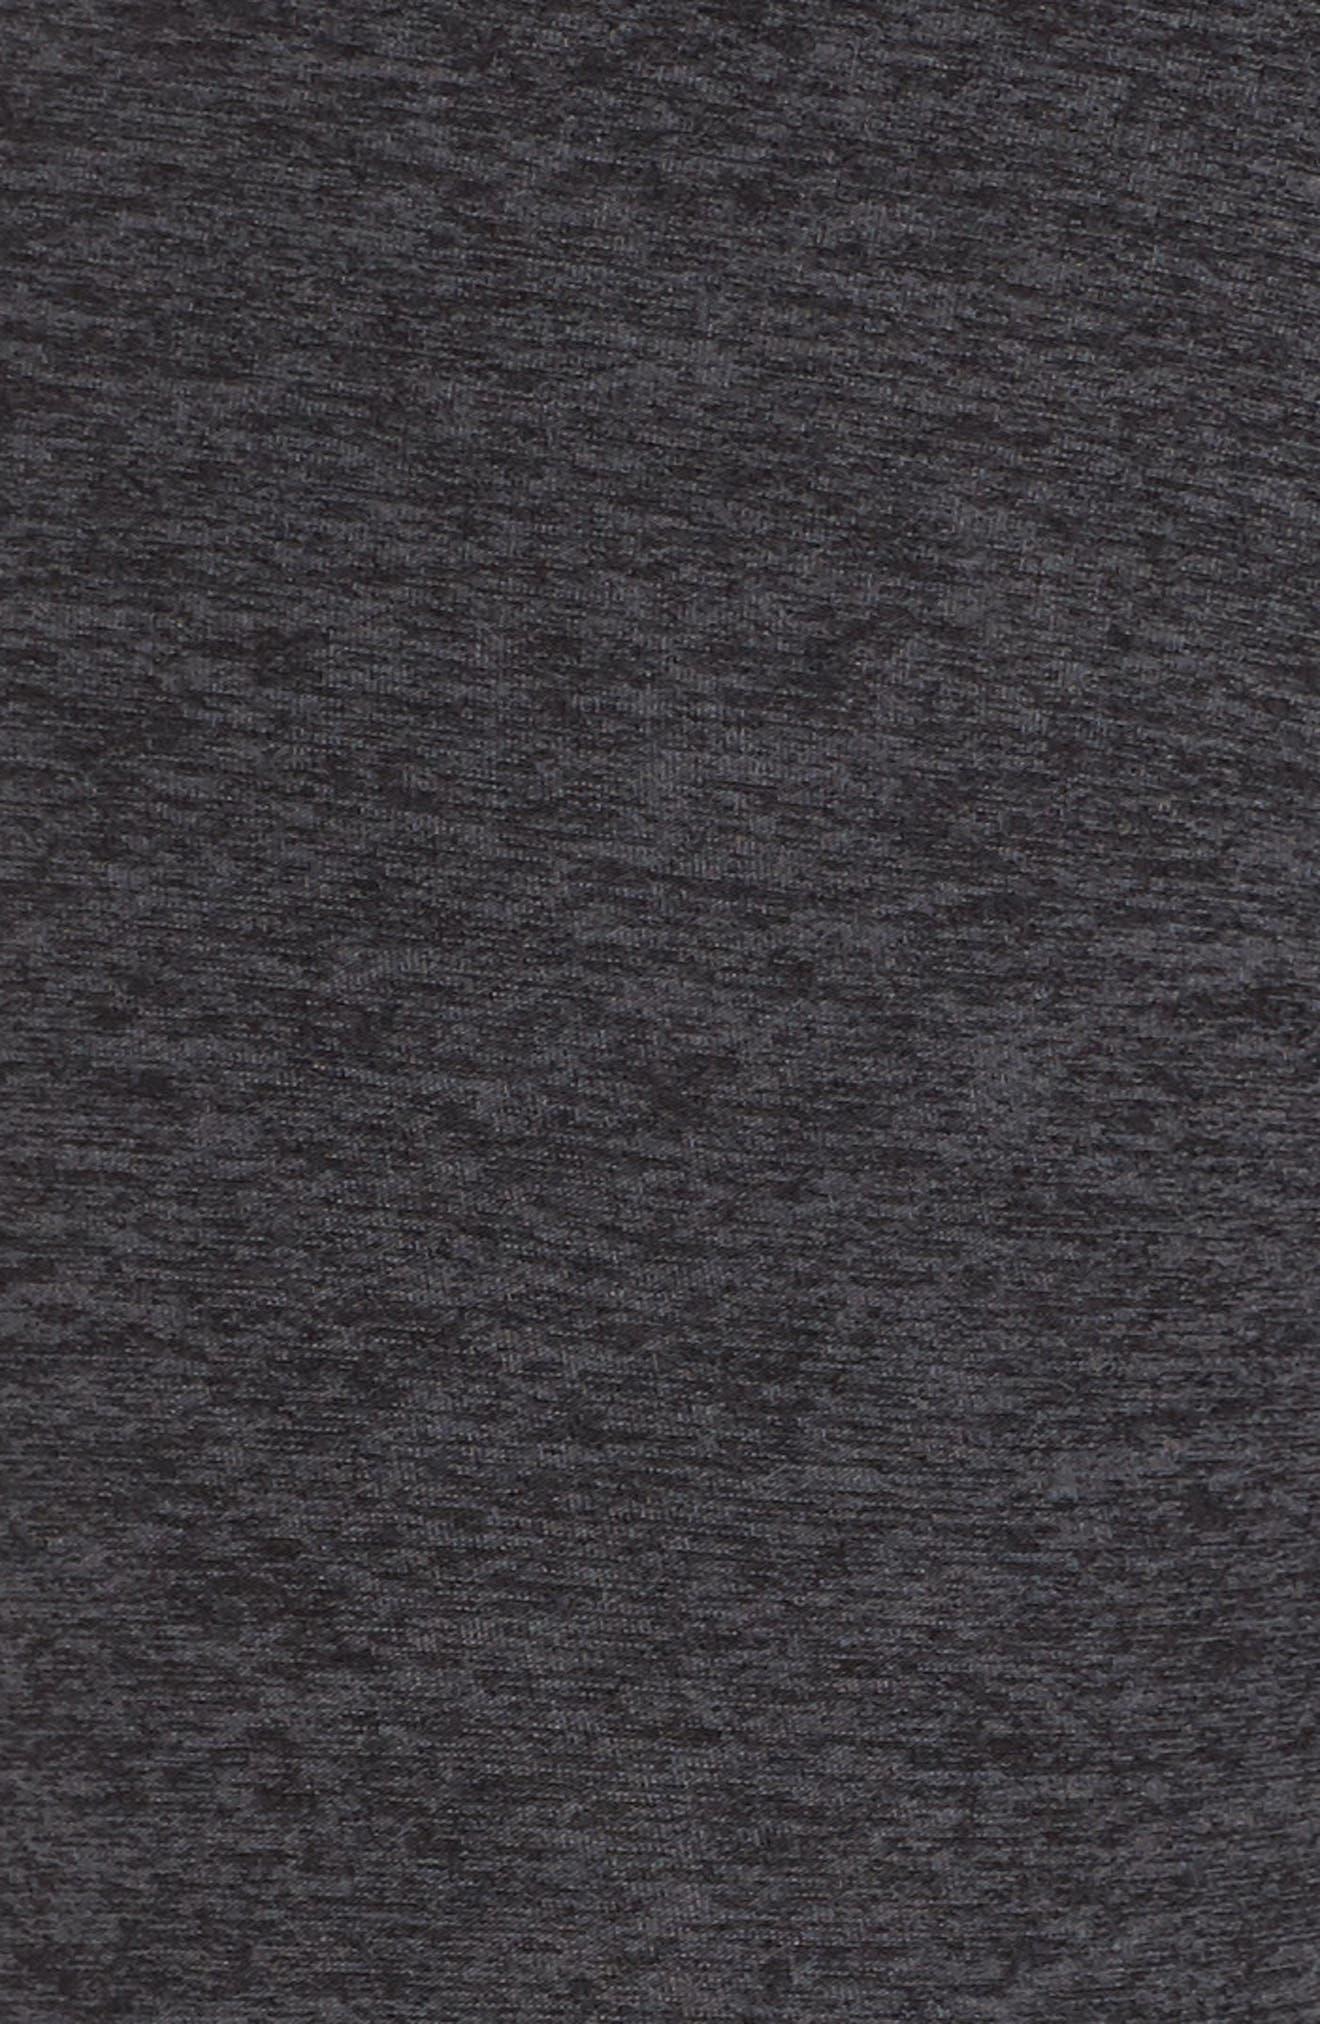 Across the Strap High Waist Leggings,                             Alternate thumbnail 6, color,                             BLACK CHARCOAL